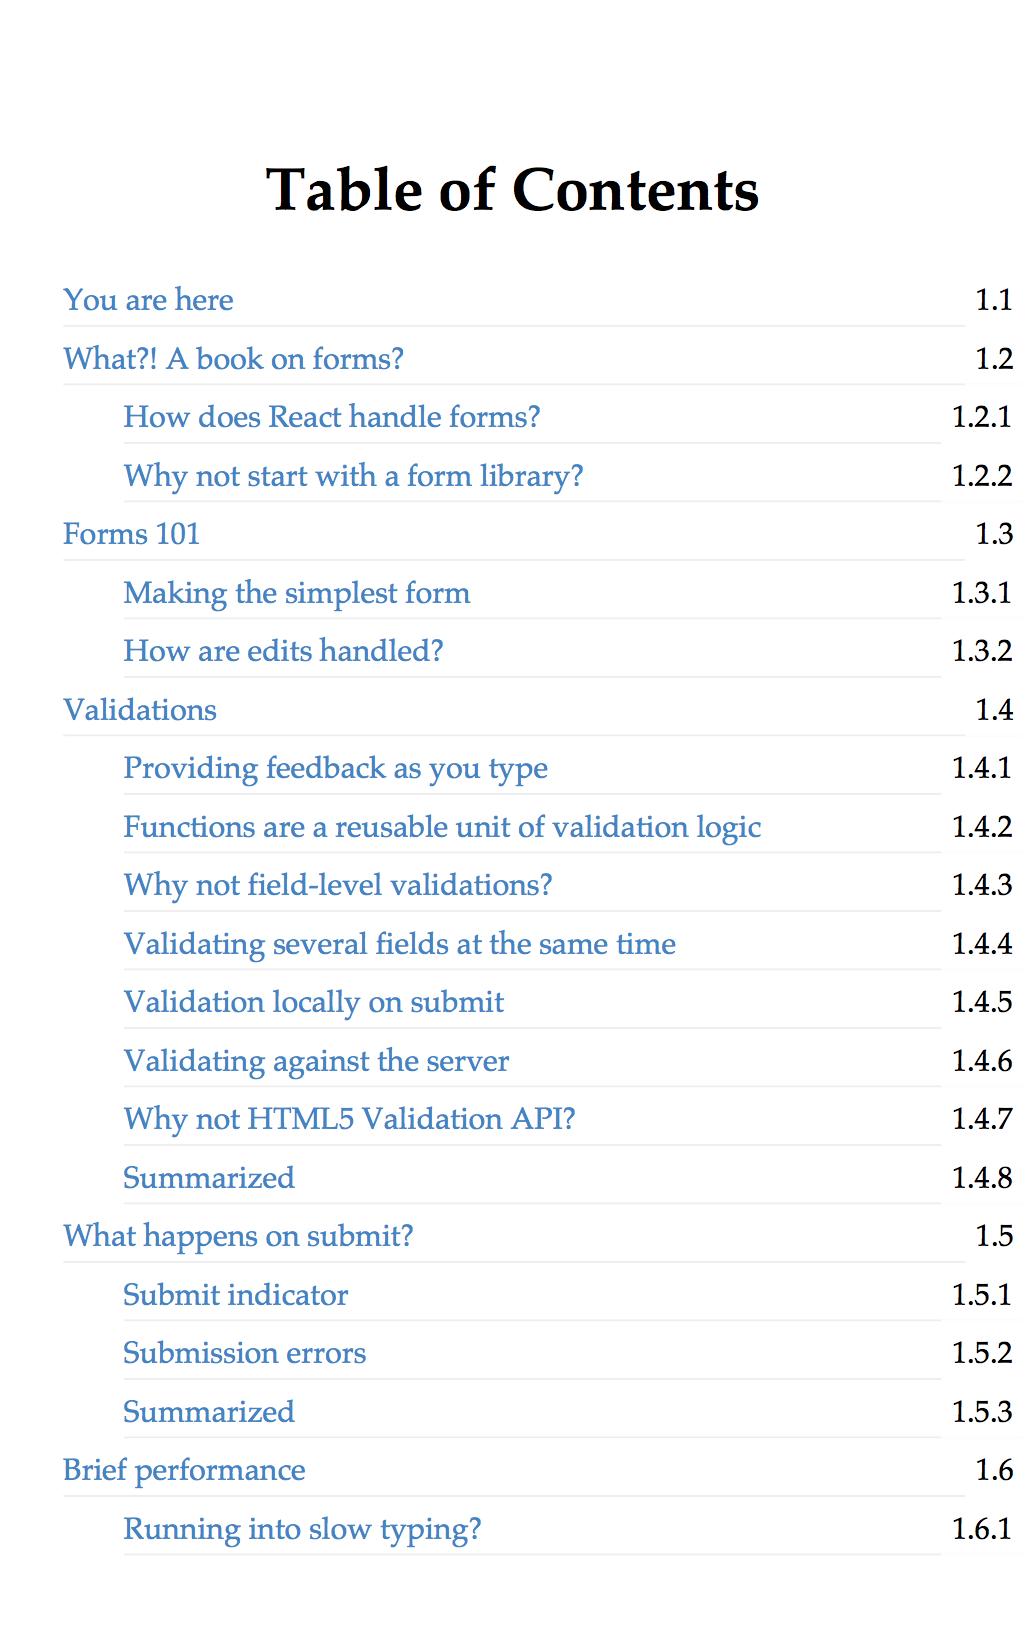 The Missing Forms Handbook of React - Gosha Arinich